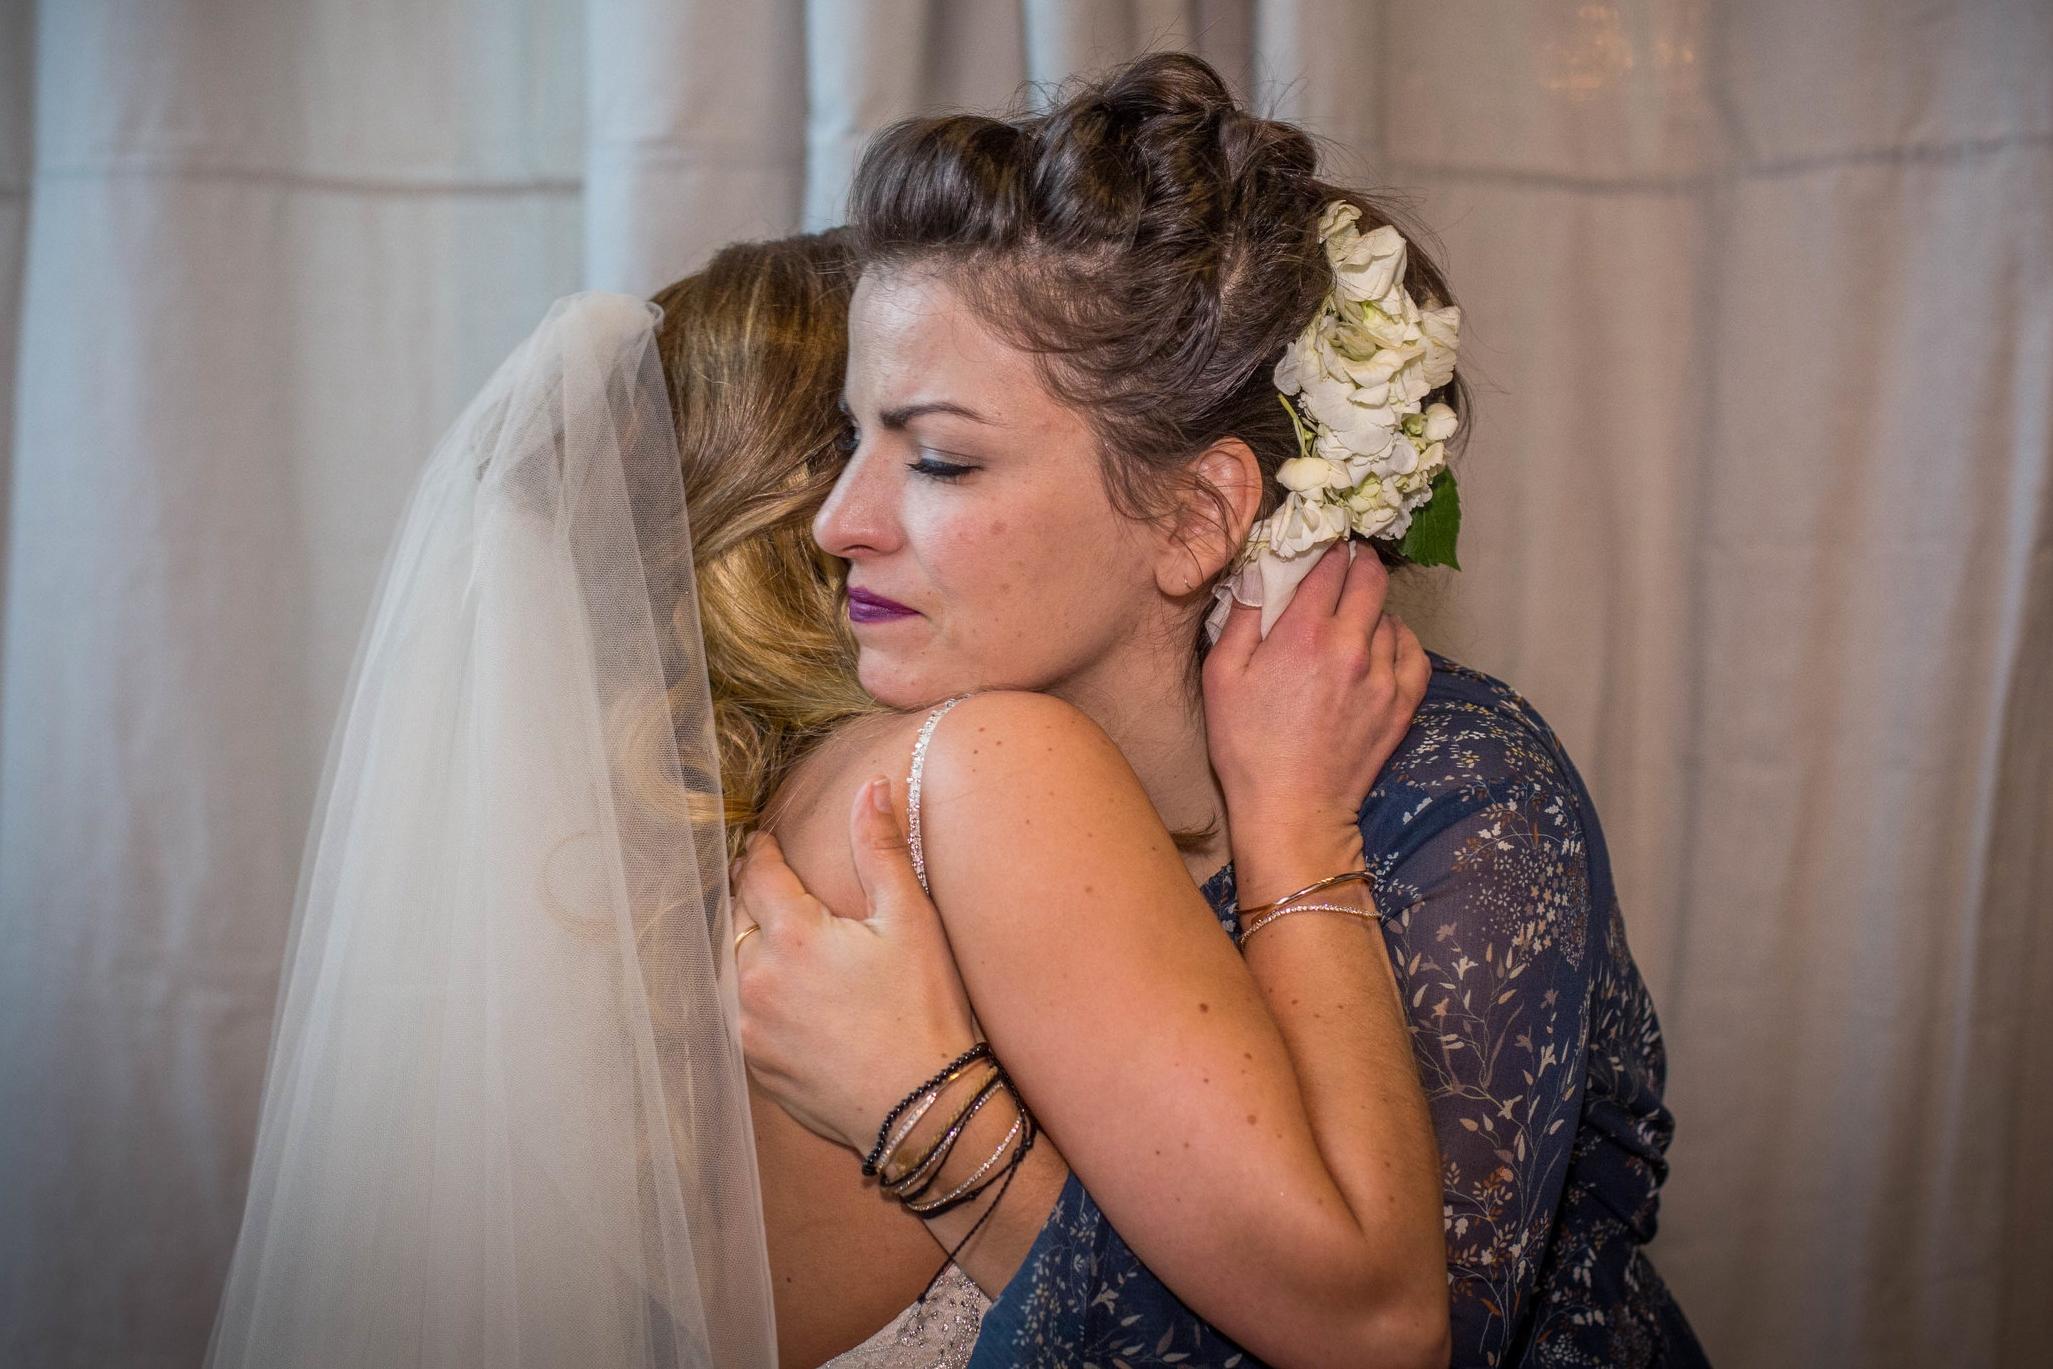 Kansas+City_Small+Wedding_Elope_Intimate_Ceremony_Best+Friends_Megan & Jeff-063.jpg